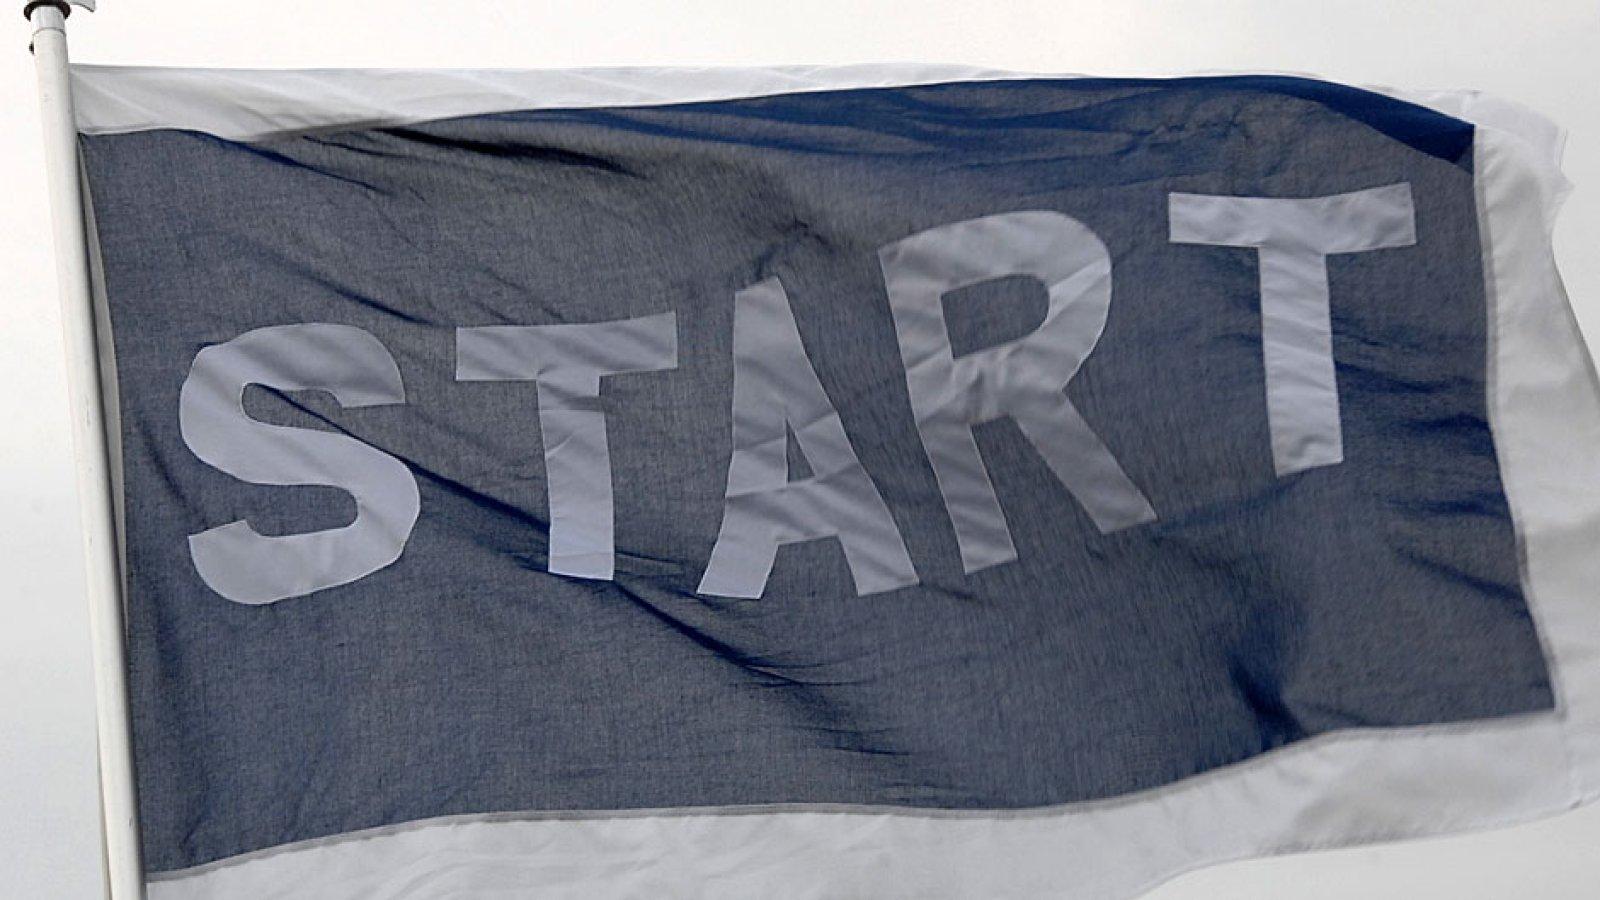 17mai IK Start flagget i vinden